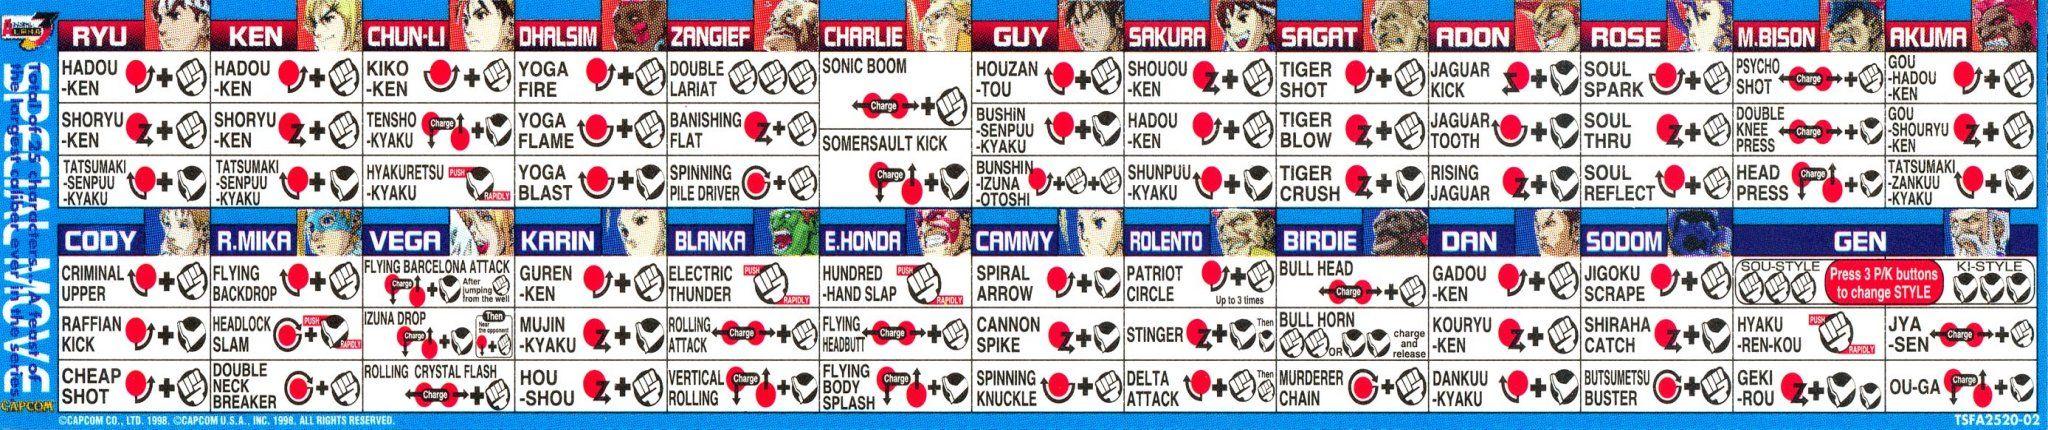 Street Fighter Alpha 3 Combos Street Fighter Street Fighter